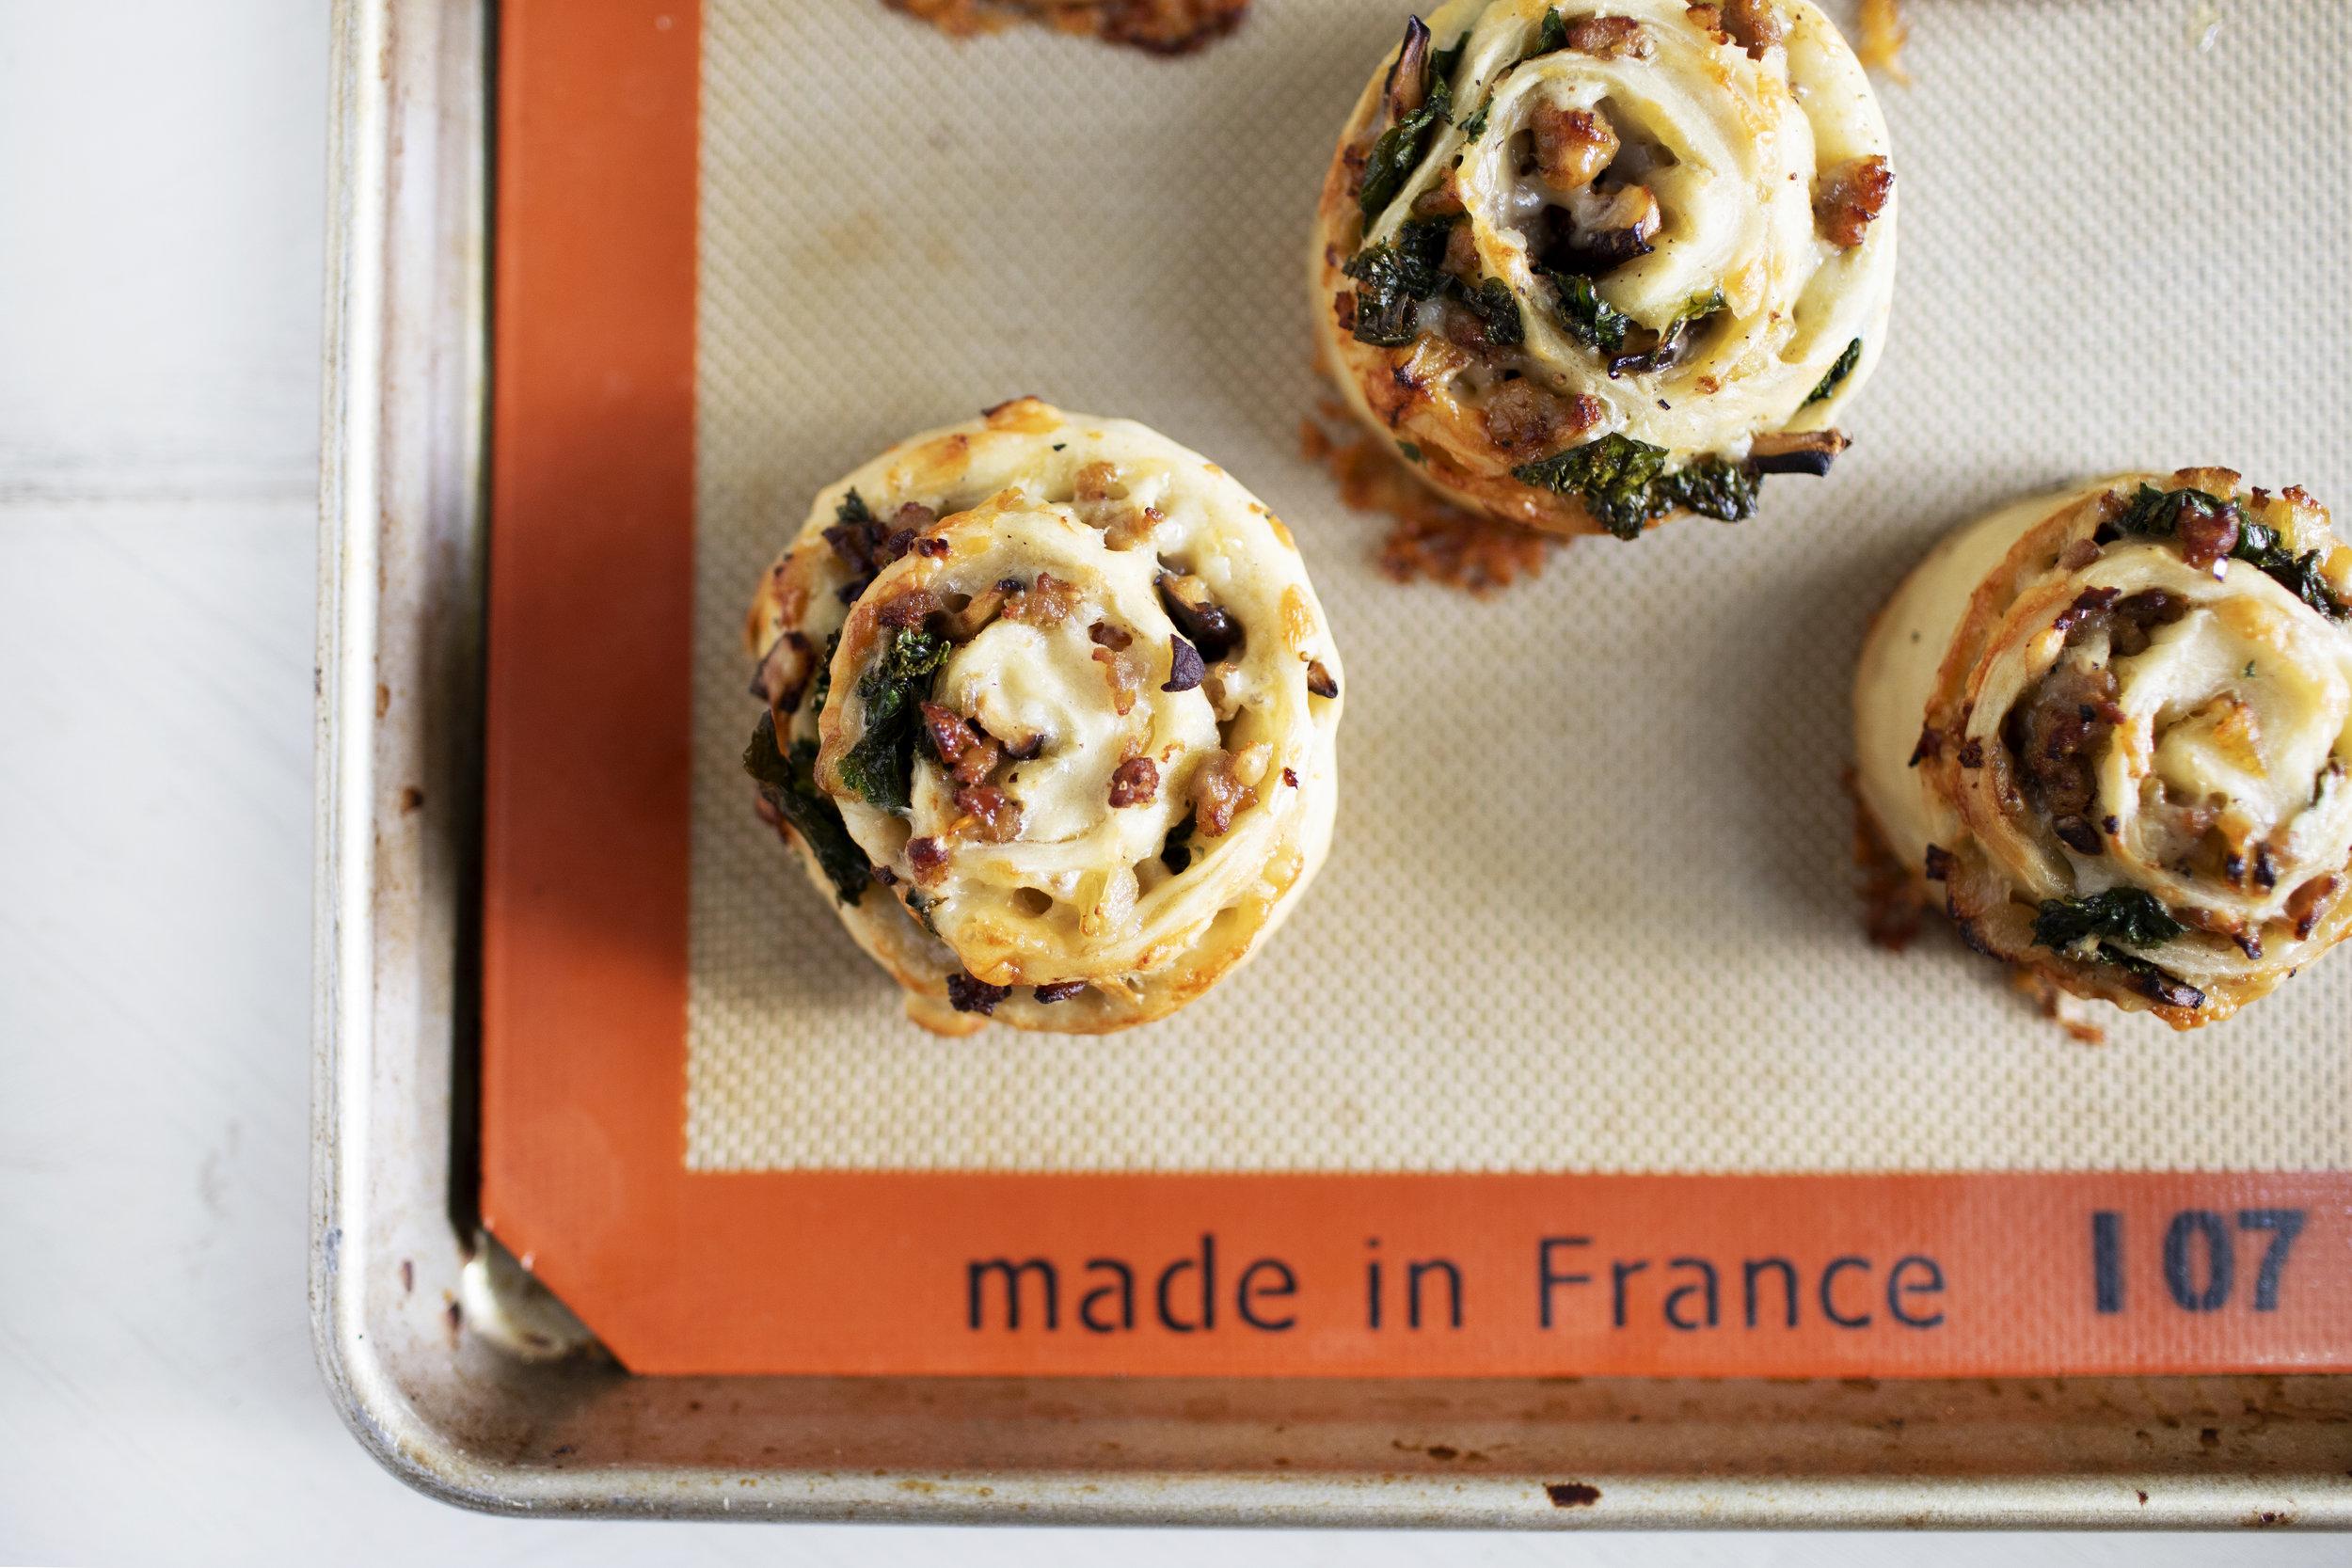 kale mushroom + sausage pizza rolls v.jpg